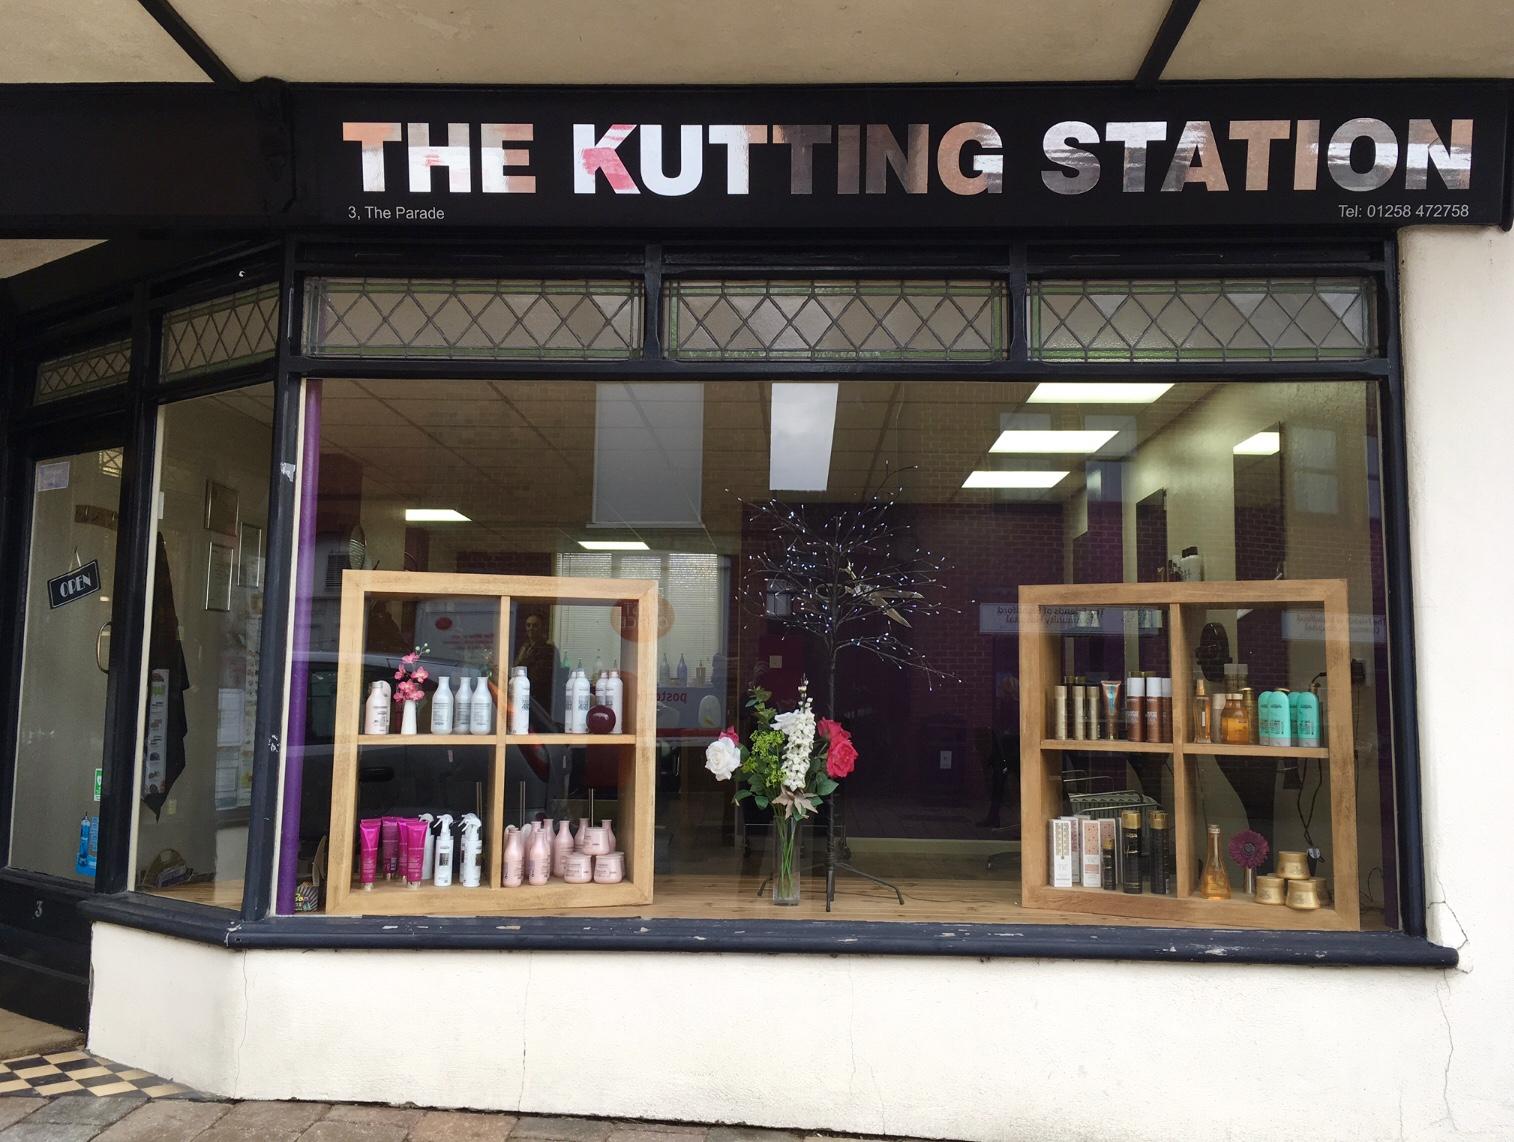 Sturminster Newton-The Kutting Station 3